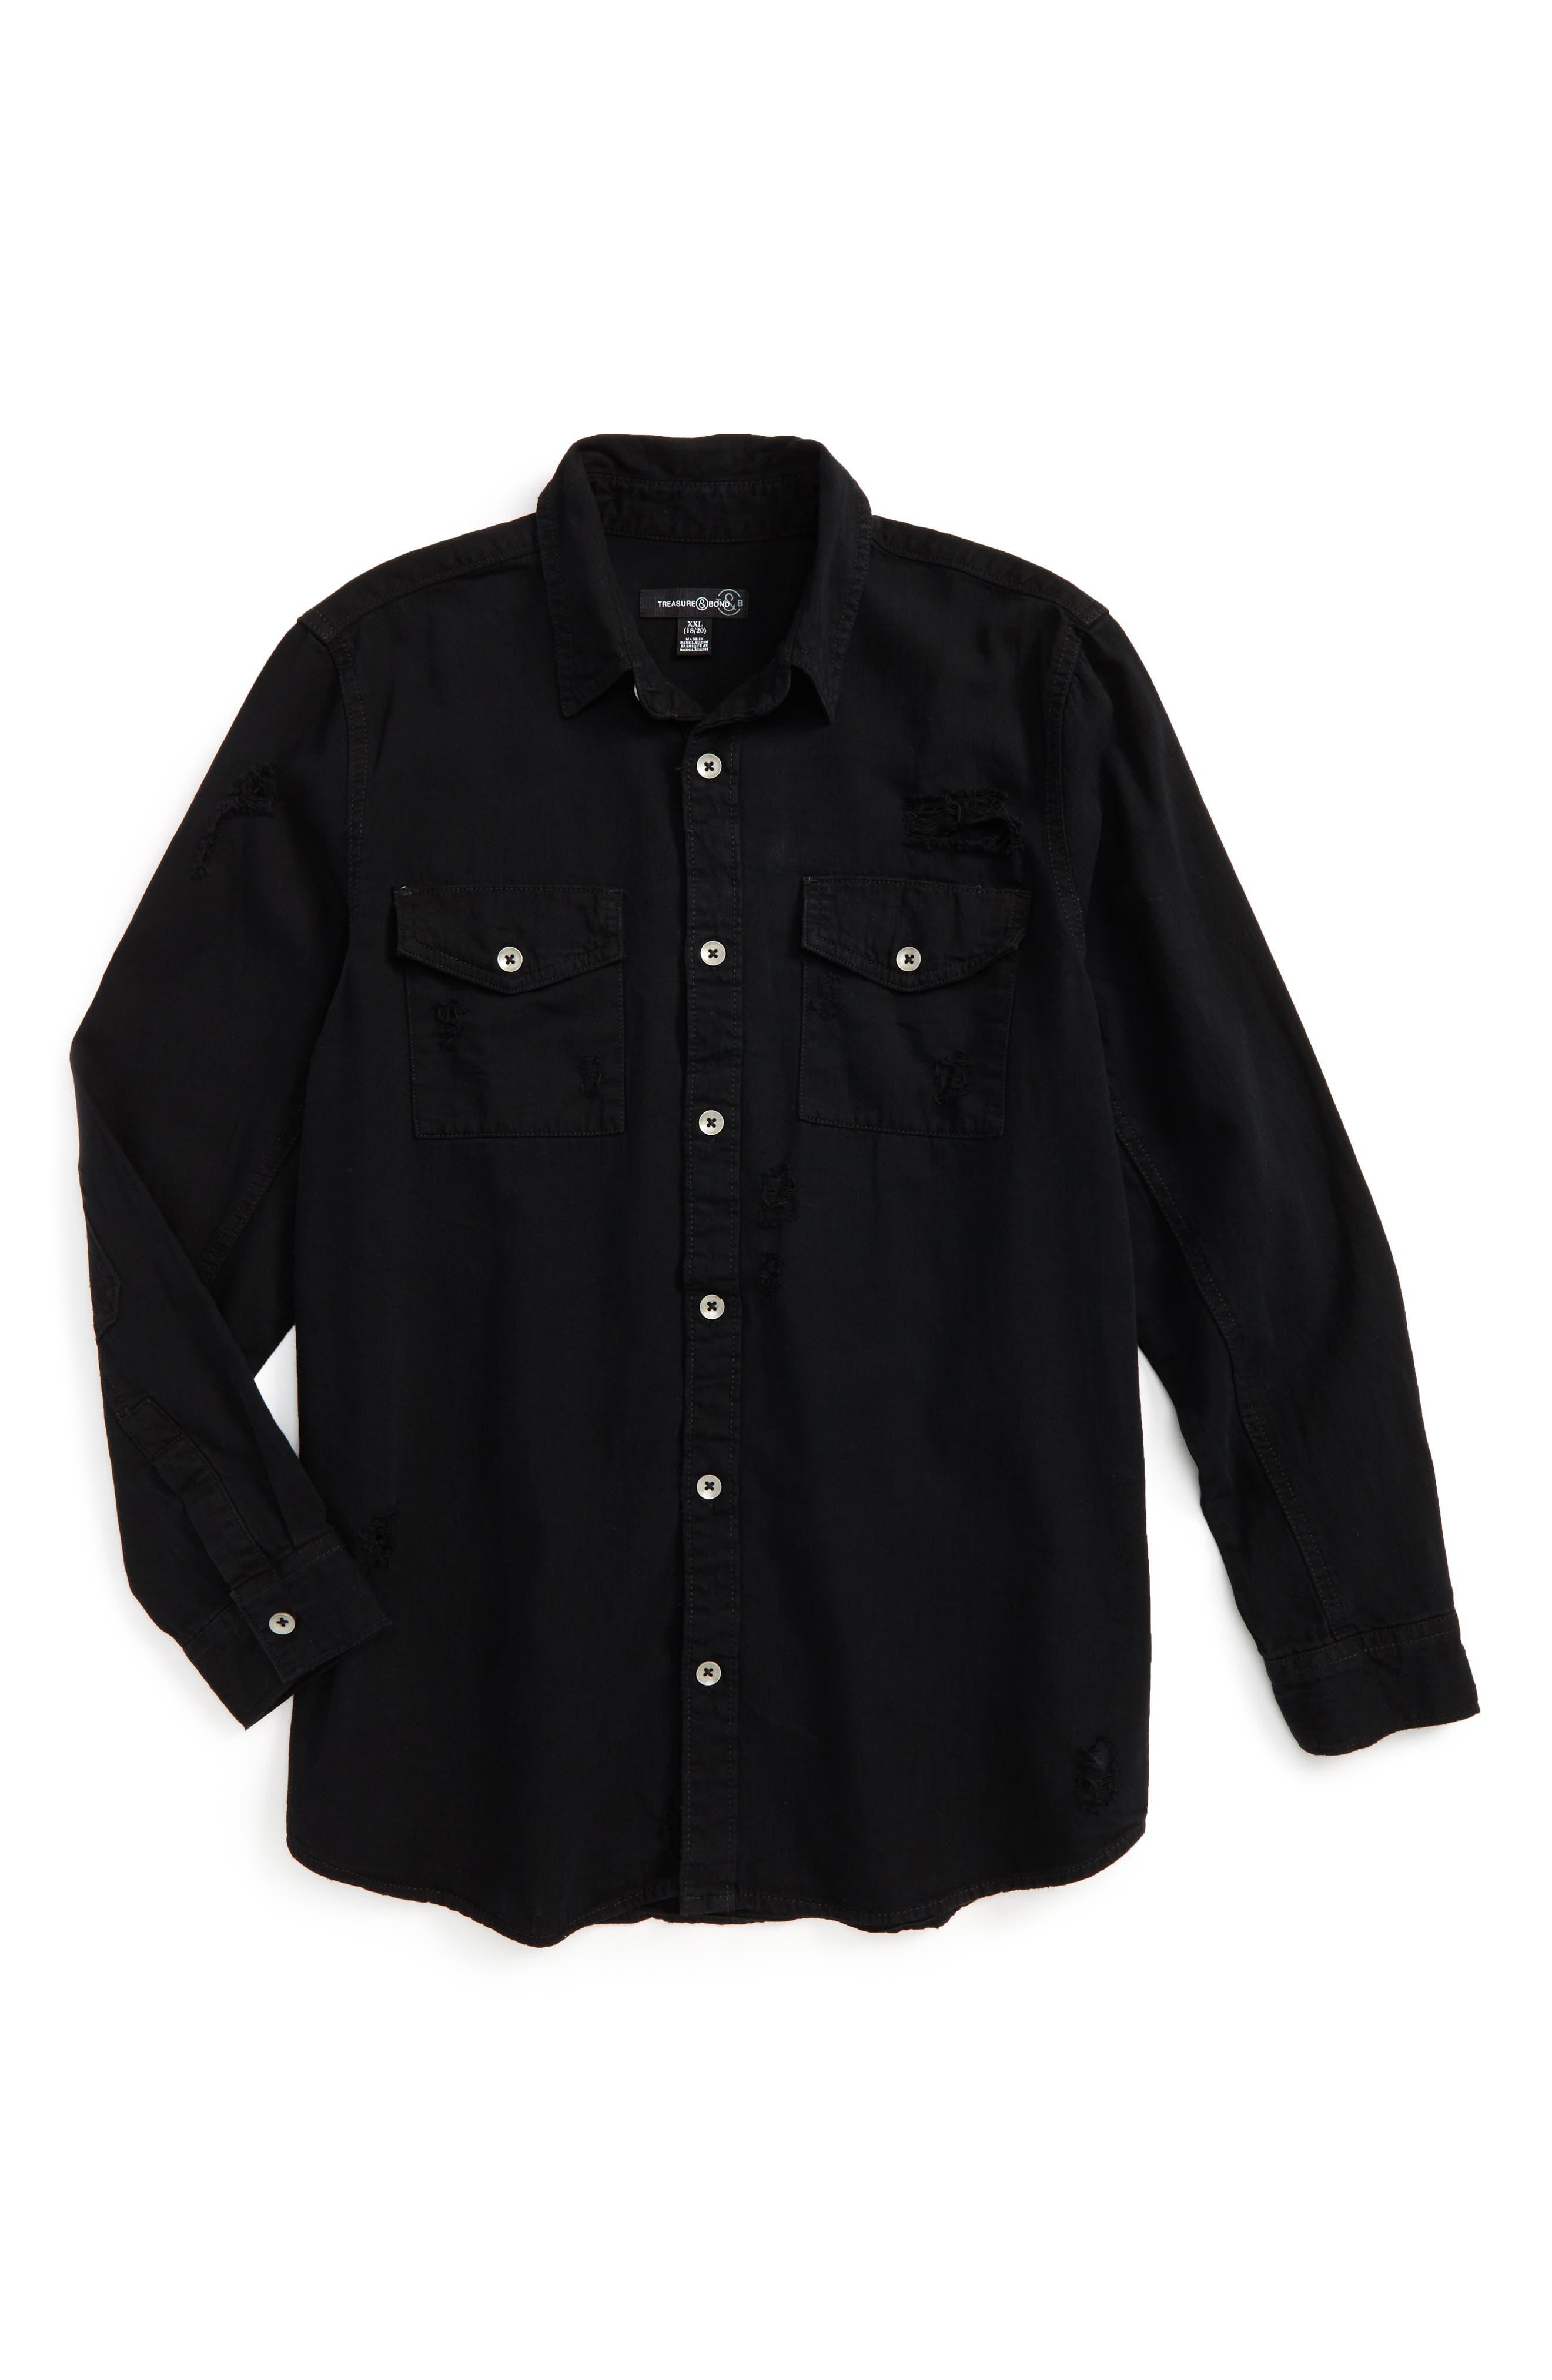 Alternate Image 1 Selected - Treasure & Bond Distressed Woven Shirt (Big Boys)